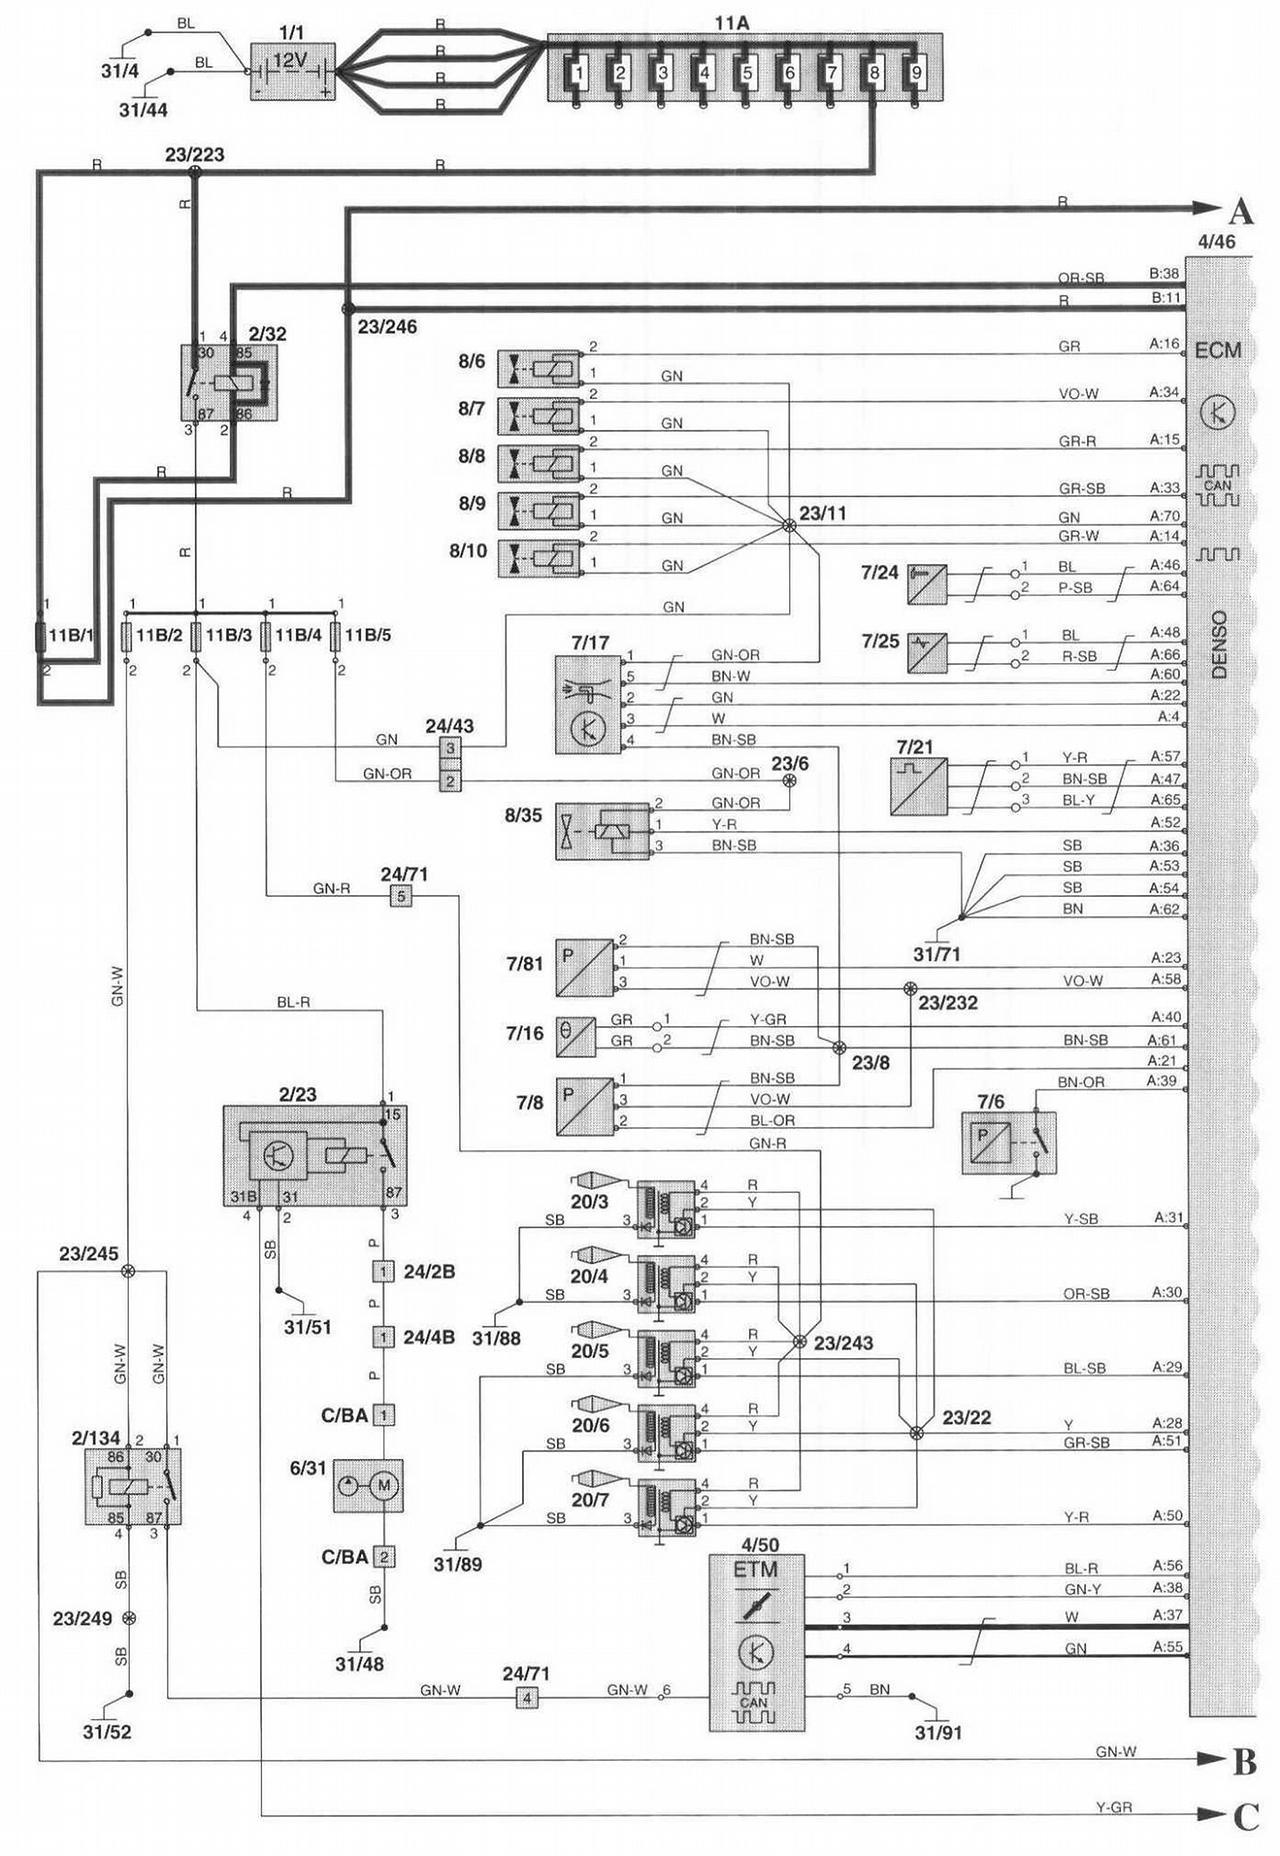 Volvo Fm7 Wiring Diagram